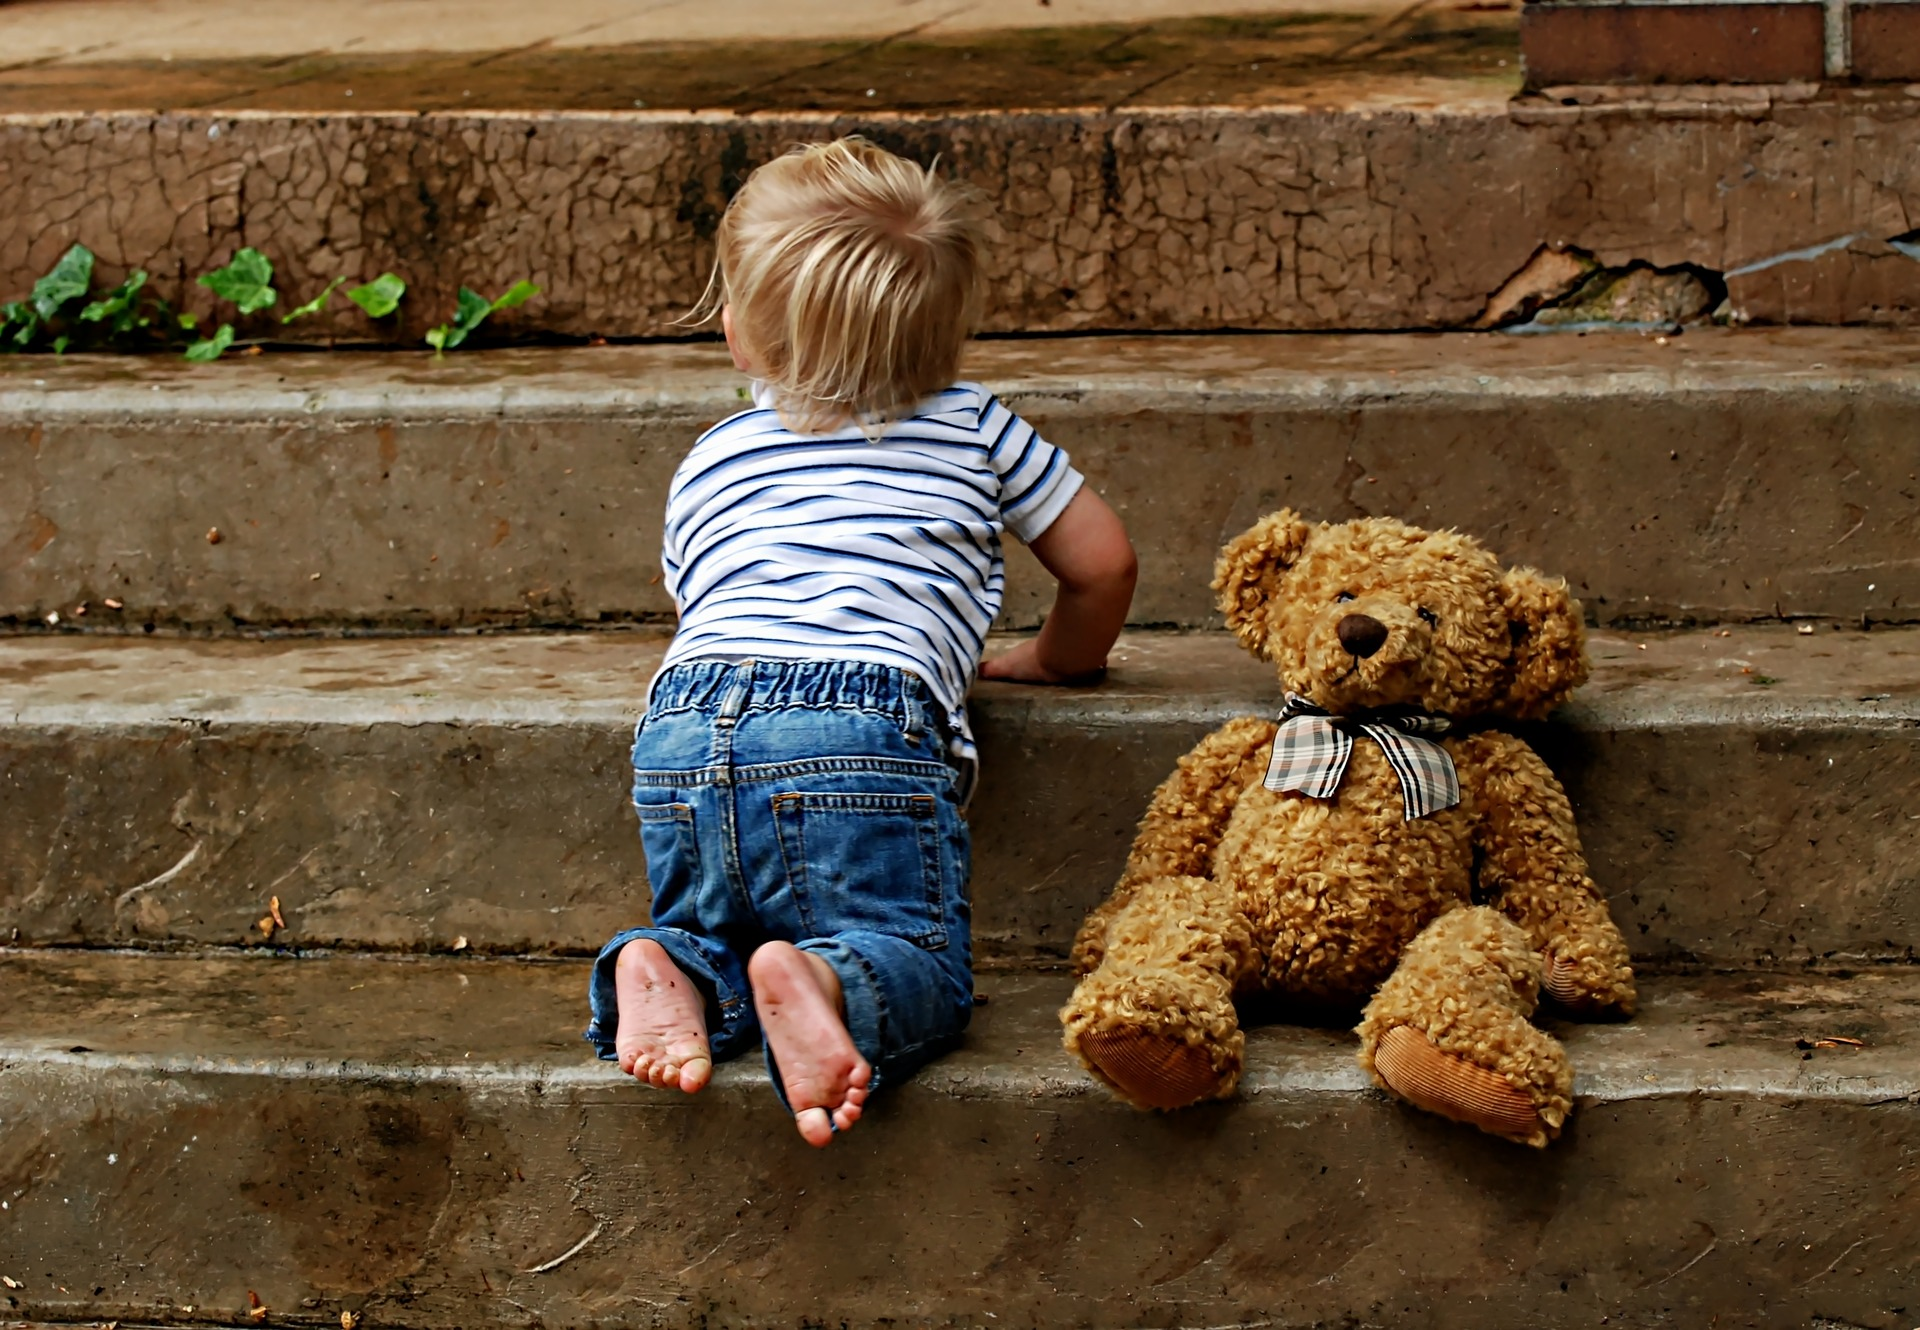 When Do Babies Start Crawling?